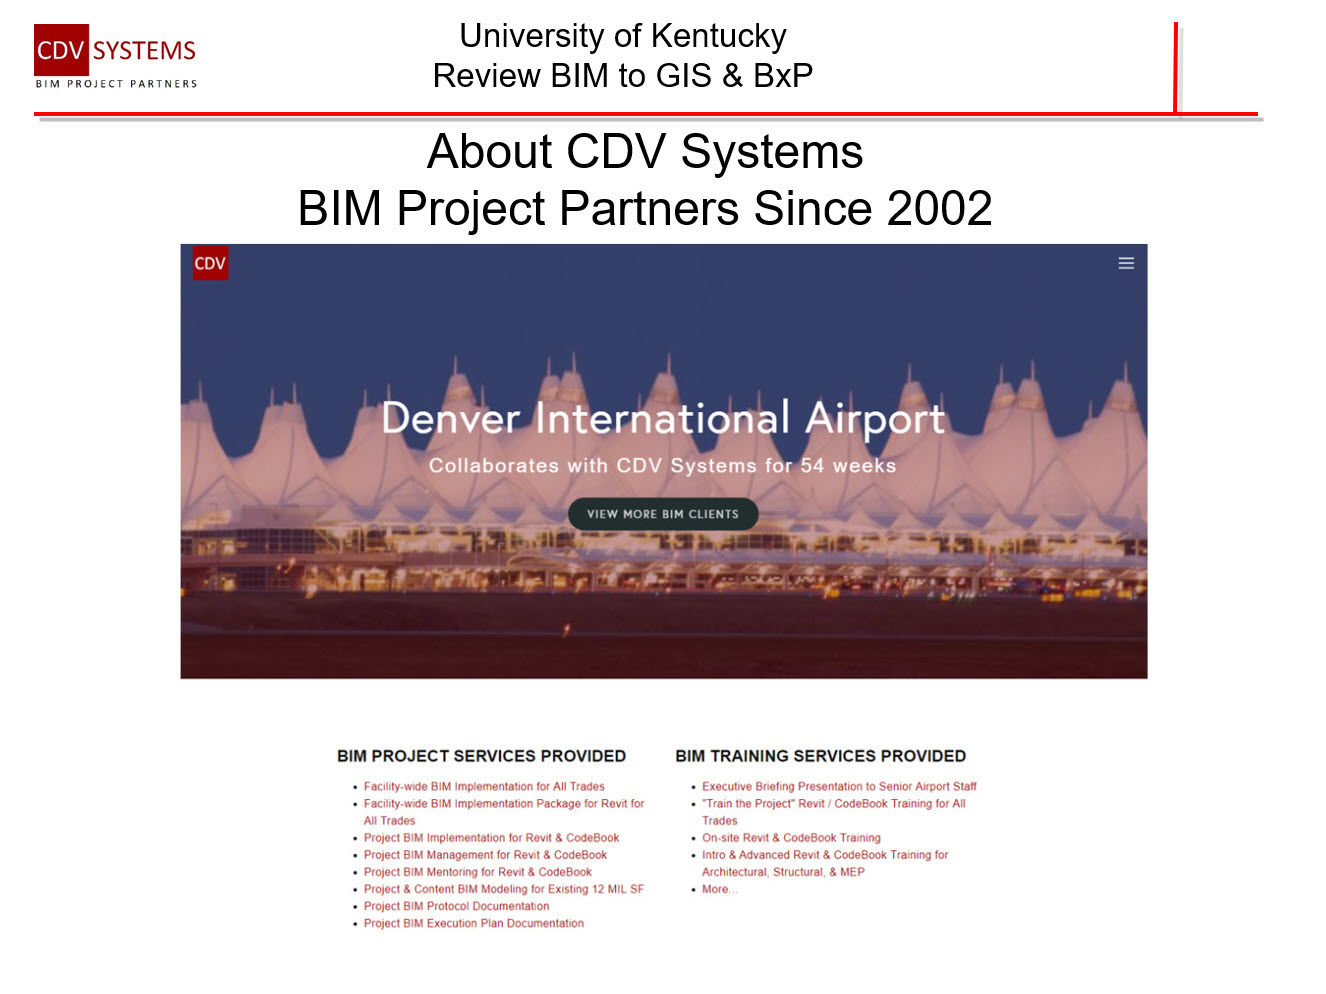 University of Kentucky_001i.jpg